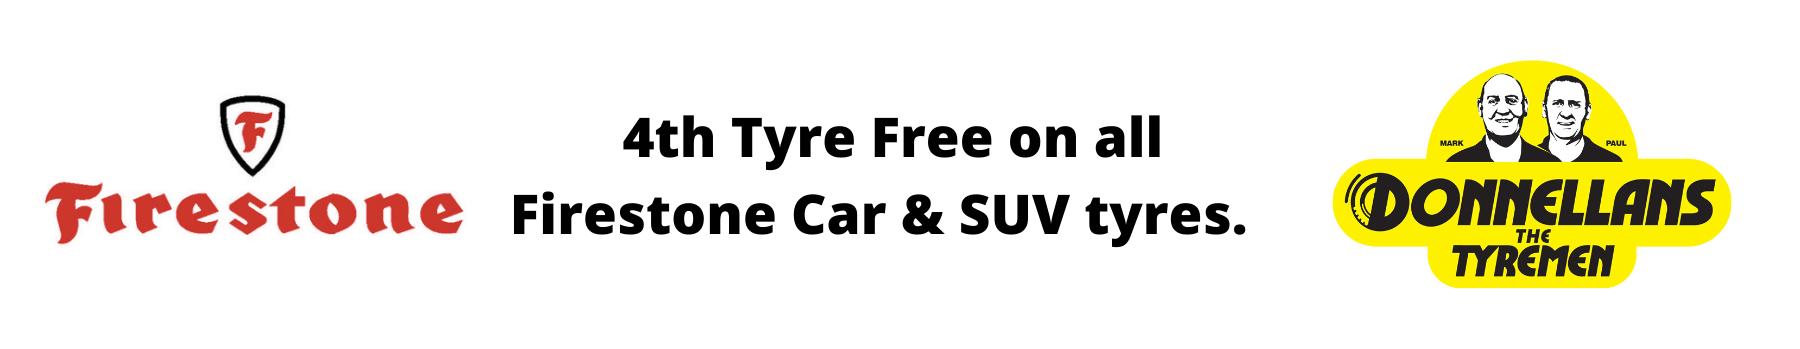 Donnellans - 4th Tyre Free on all Firestone Car & SUV